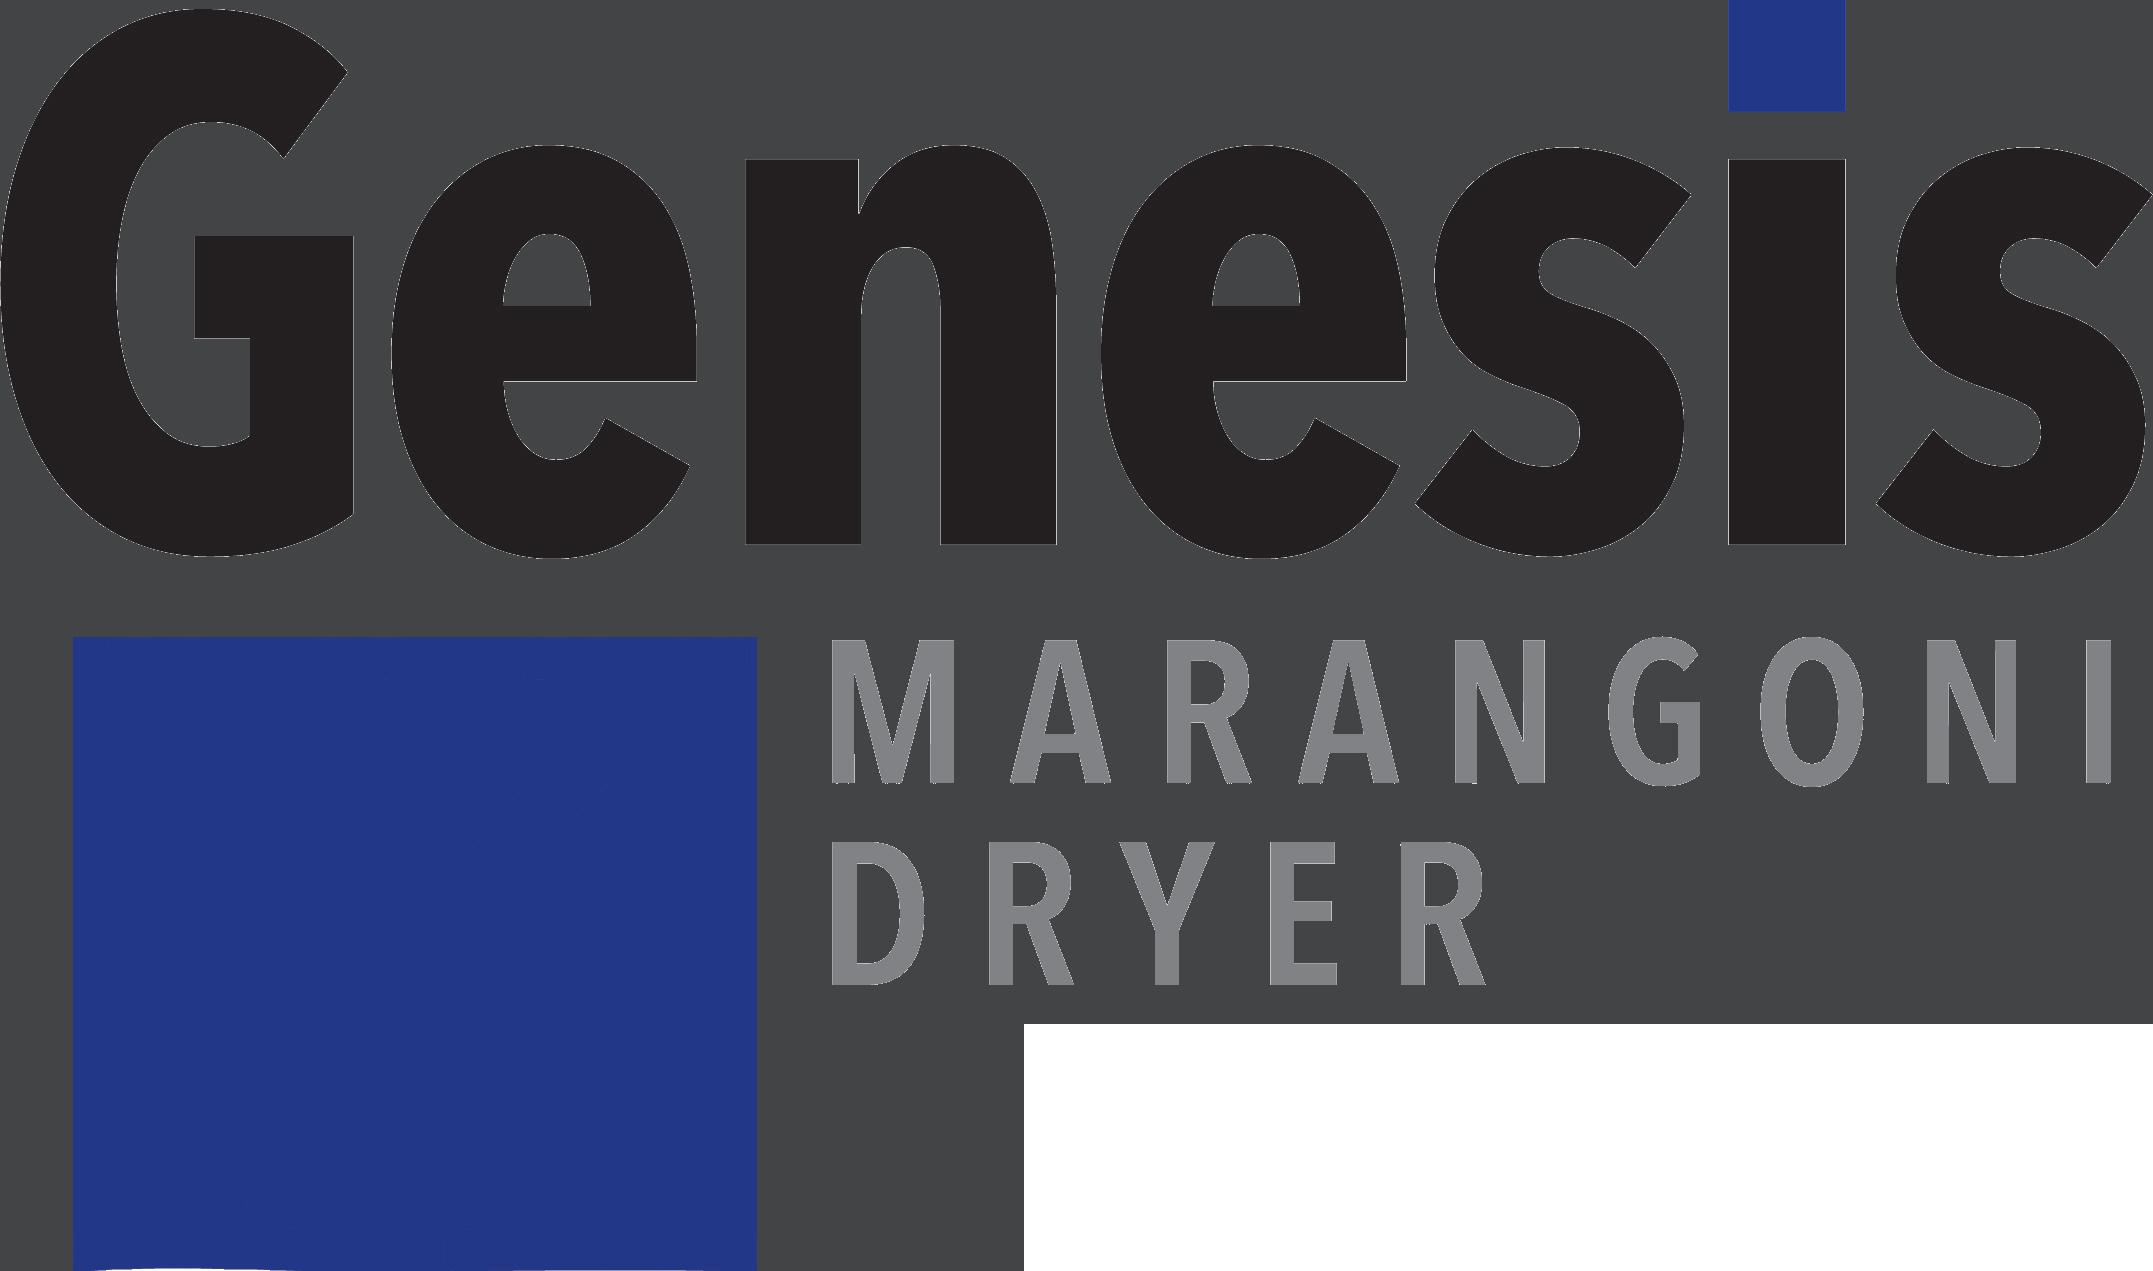 genesis-maragoni-dryer-logo